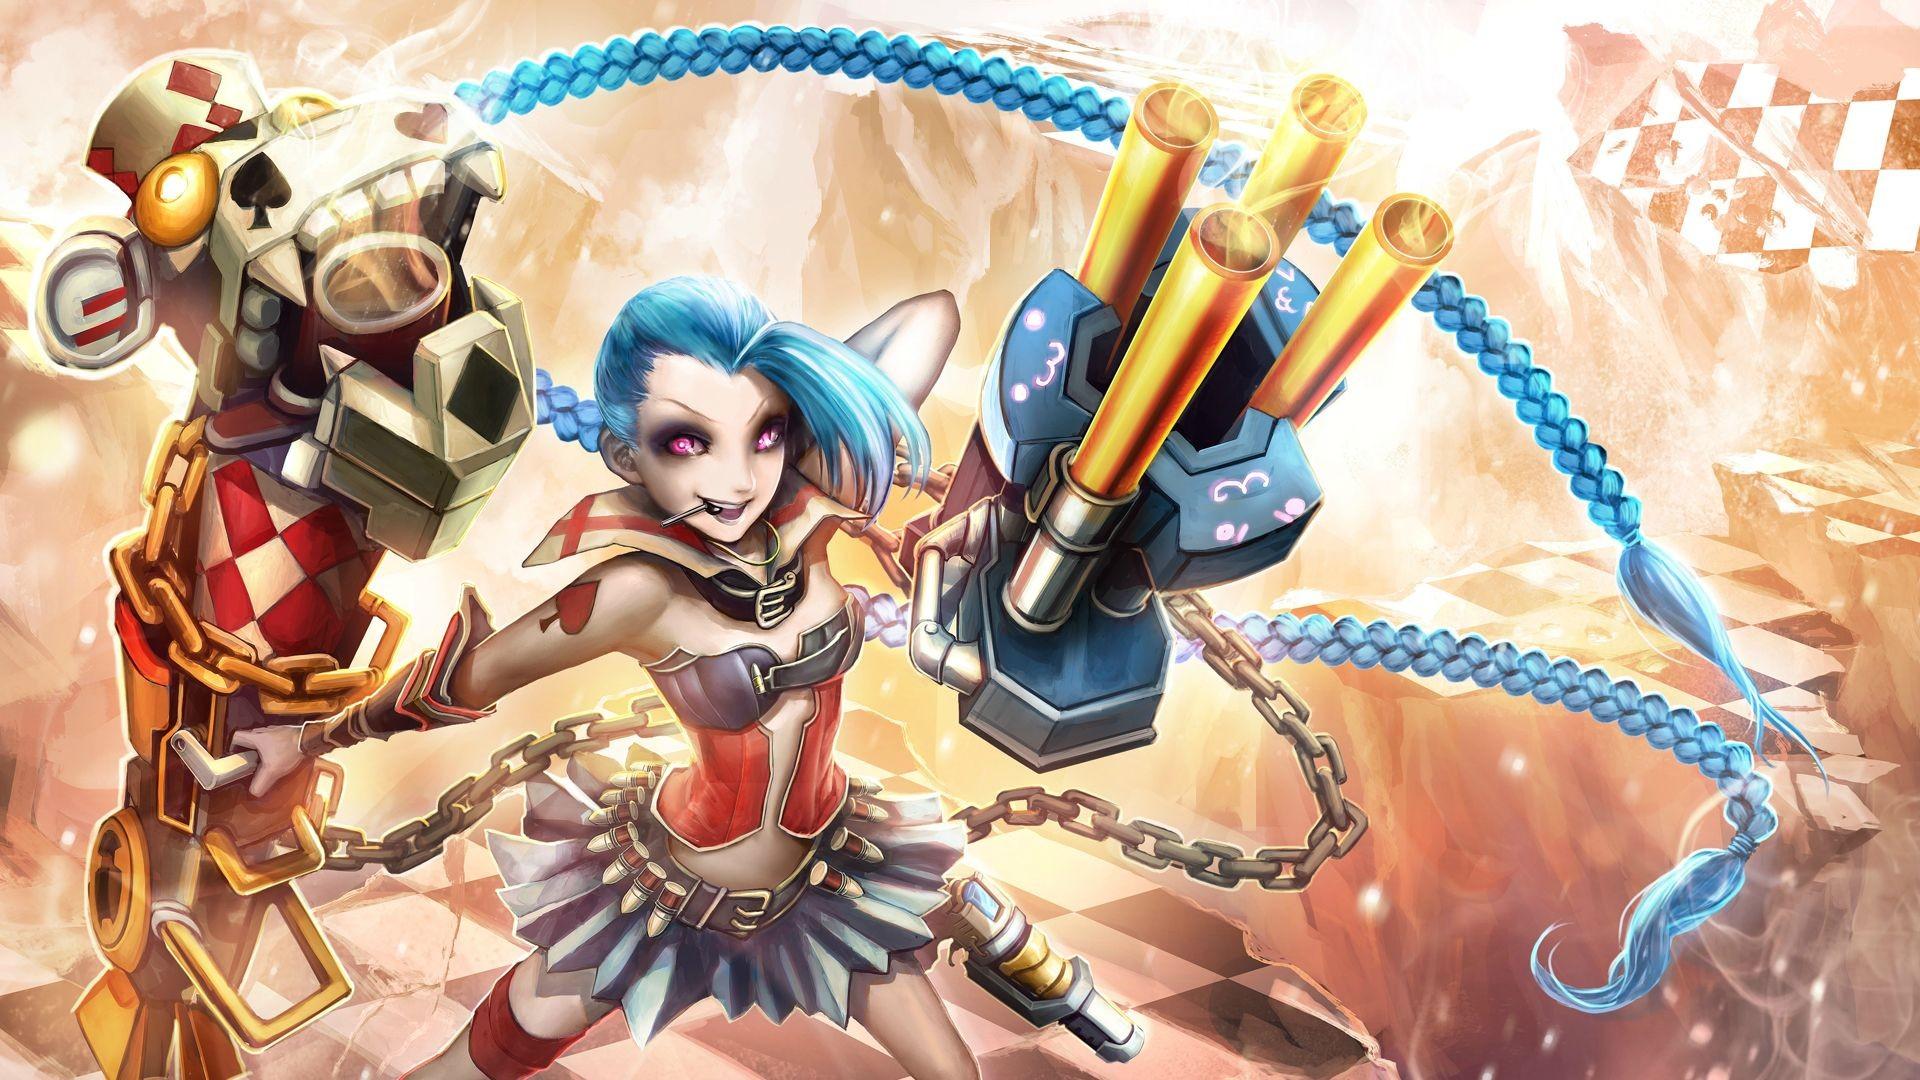 Anime 1920x1080 Jinx (League of Legends) League of Legends PC gaming